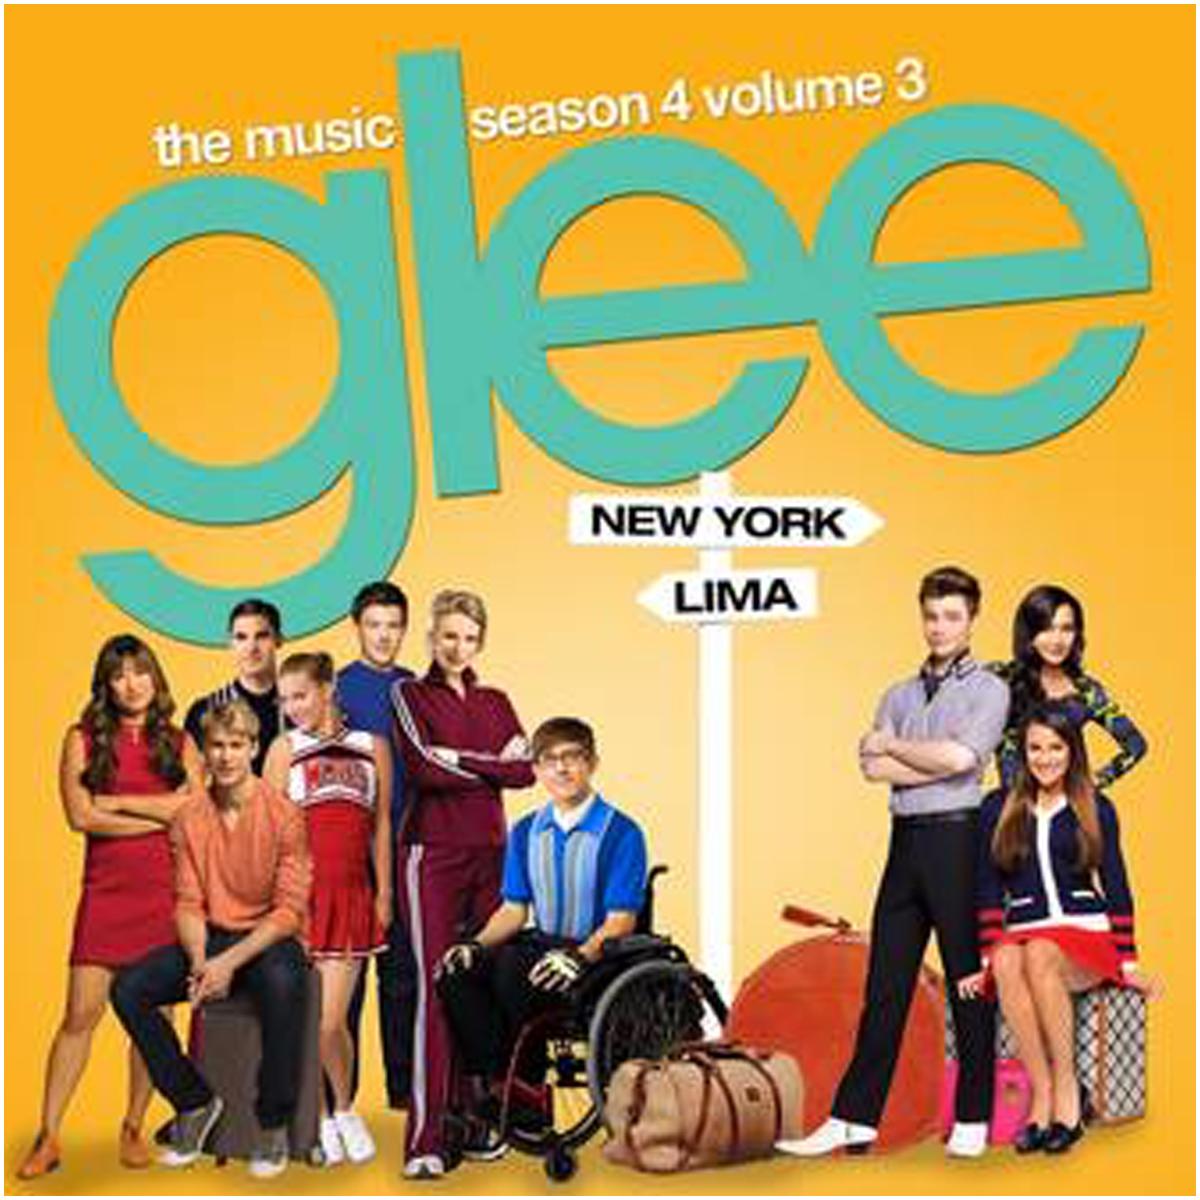 Glee_S4_thumb.jpg